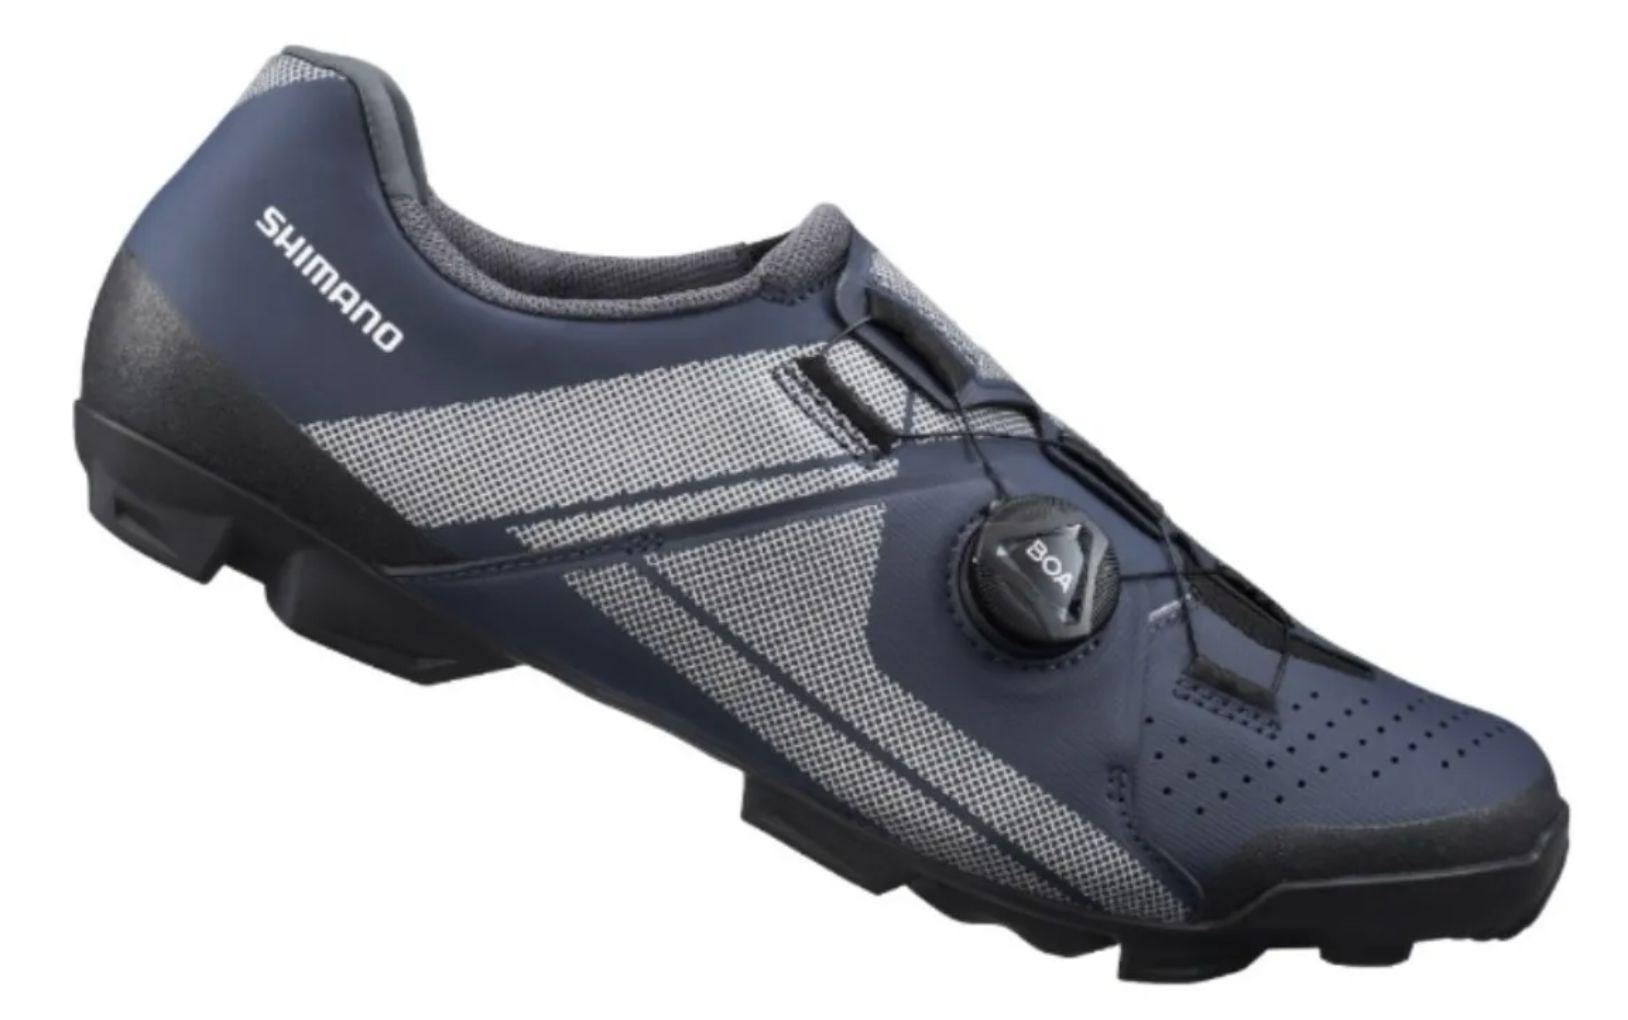 Sapatilha Shimano Sh-xc300 Xc3 Sistema Boa Pedal Clip Azul